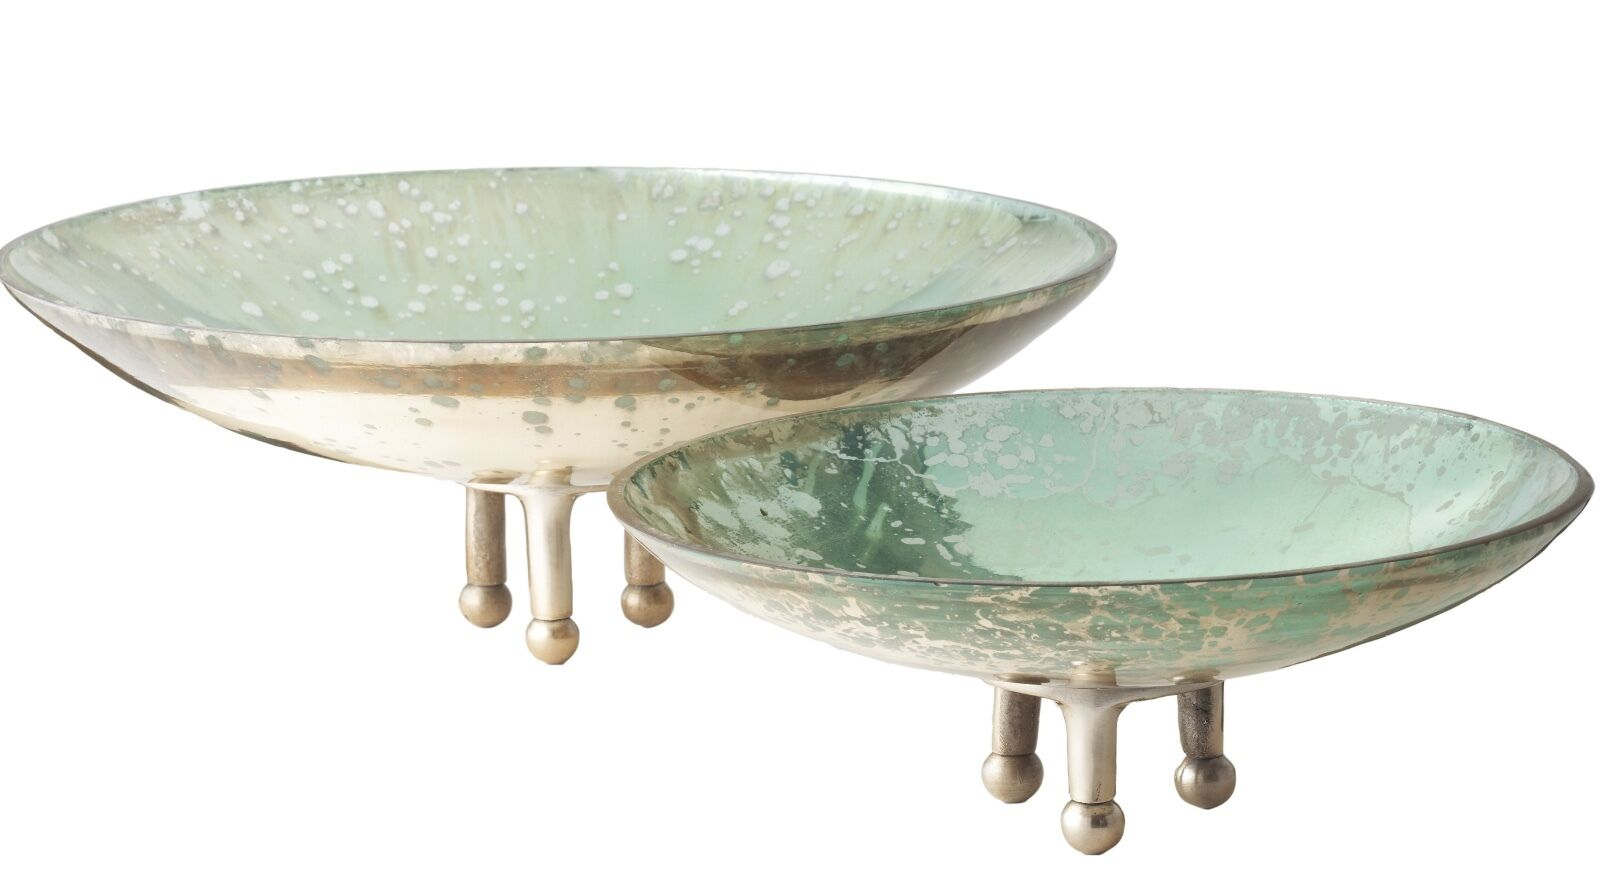 NEW Bohemian Mercury Pedestal Bowl Blau Grün Gilded Glass Decorative Art Object